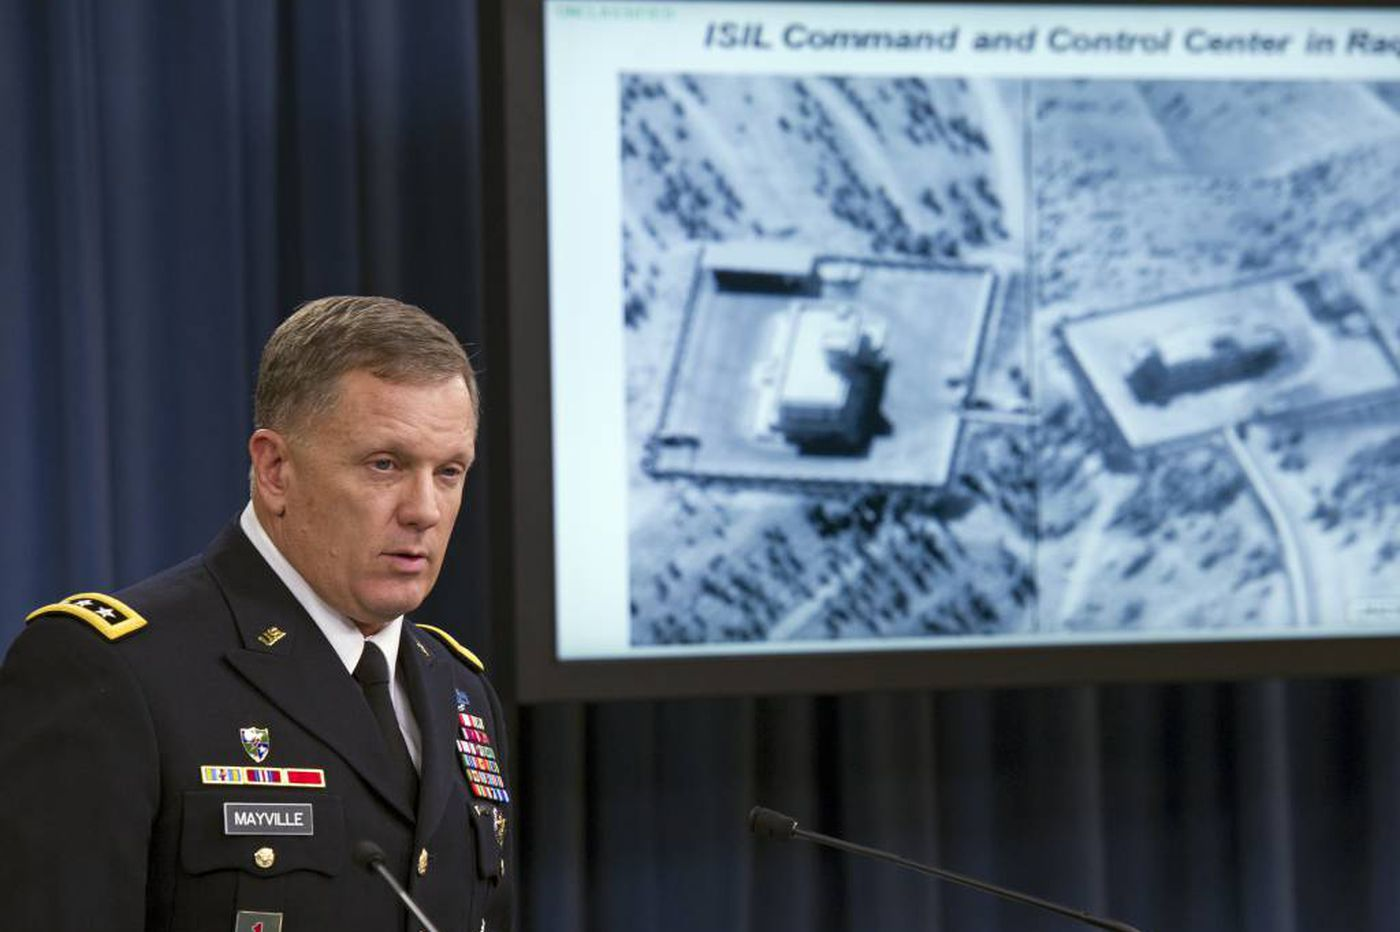 Syria says it shot down U.S. drone